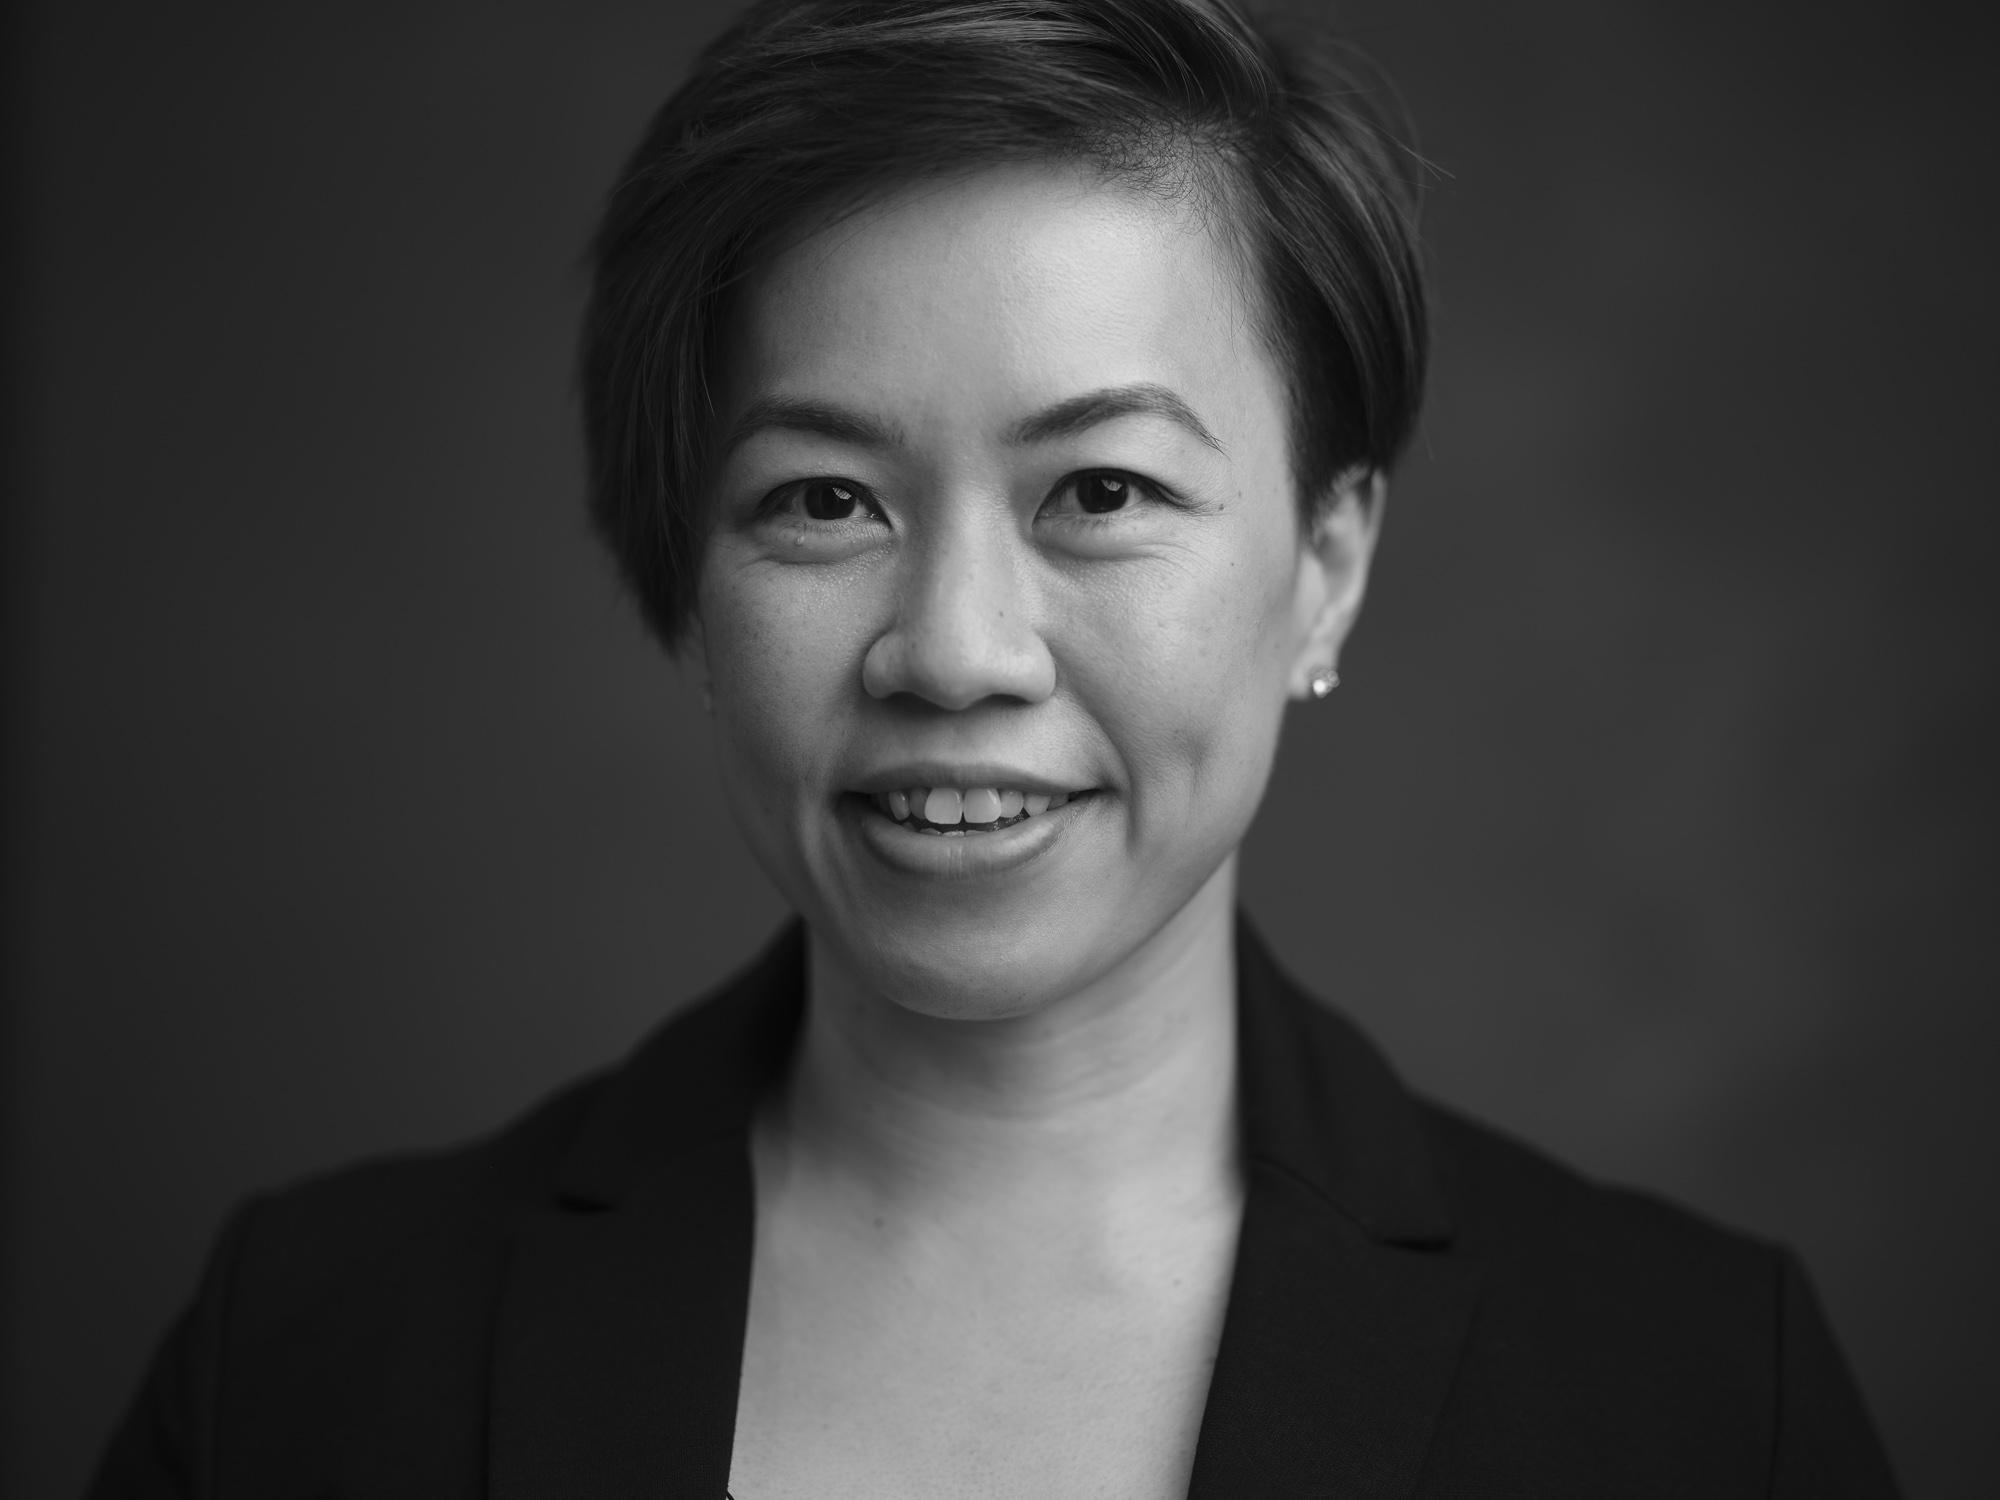 Black and White Portrait Photography Singapore Headshot Photographer COCO Creative Studio 2